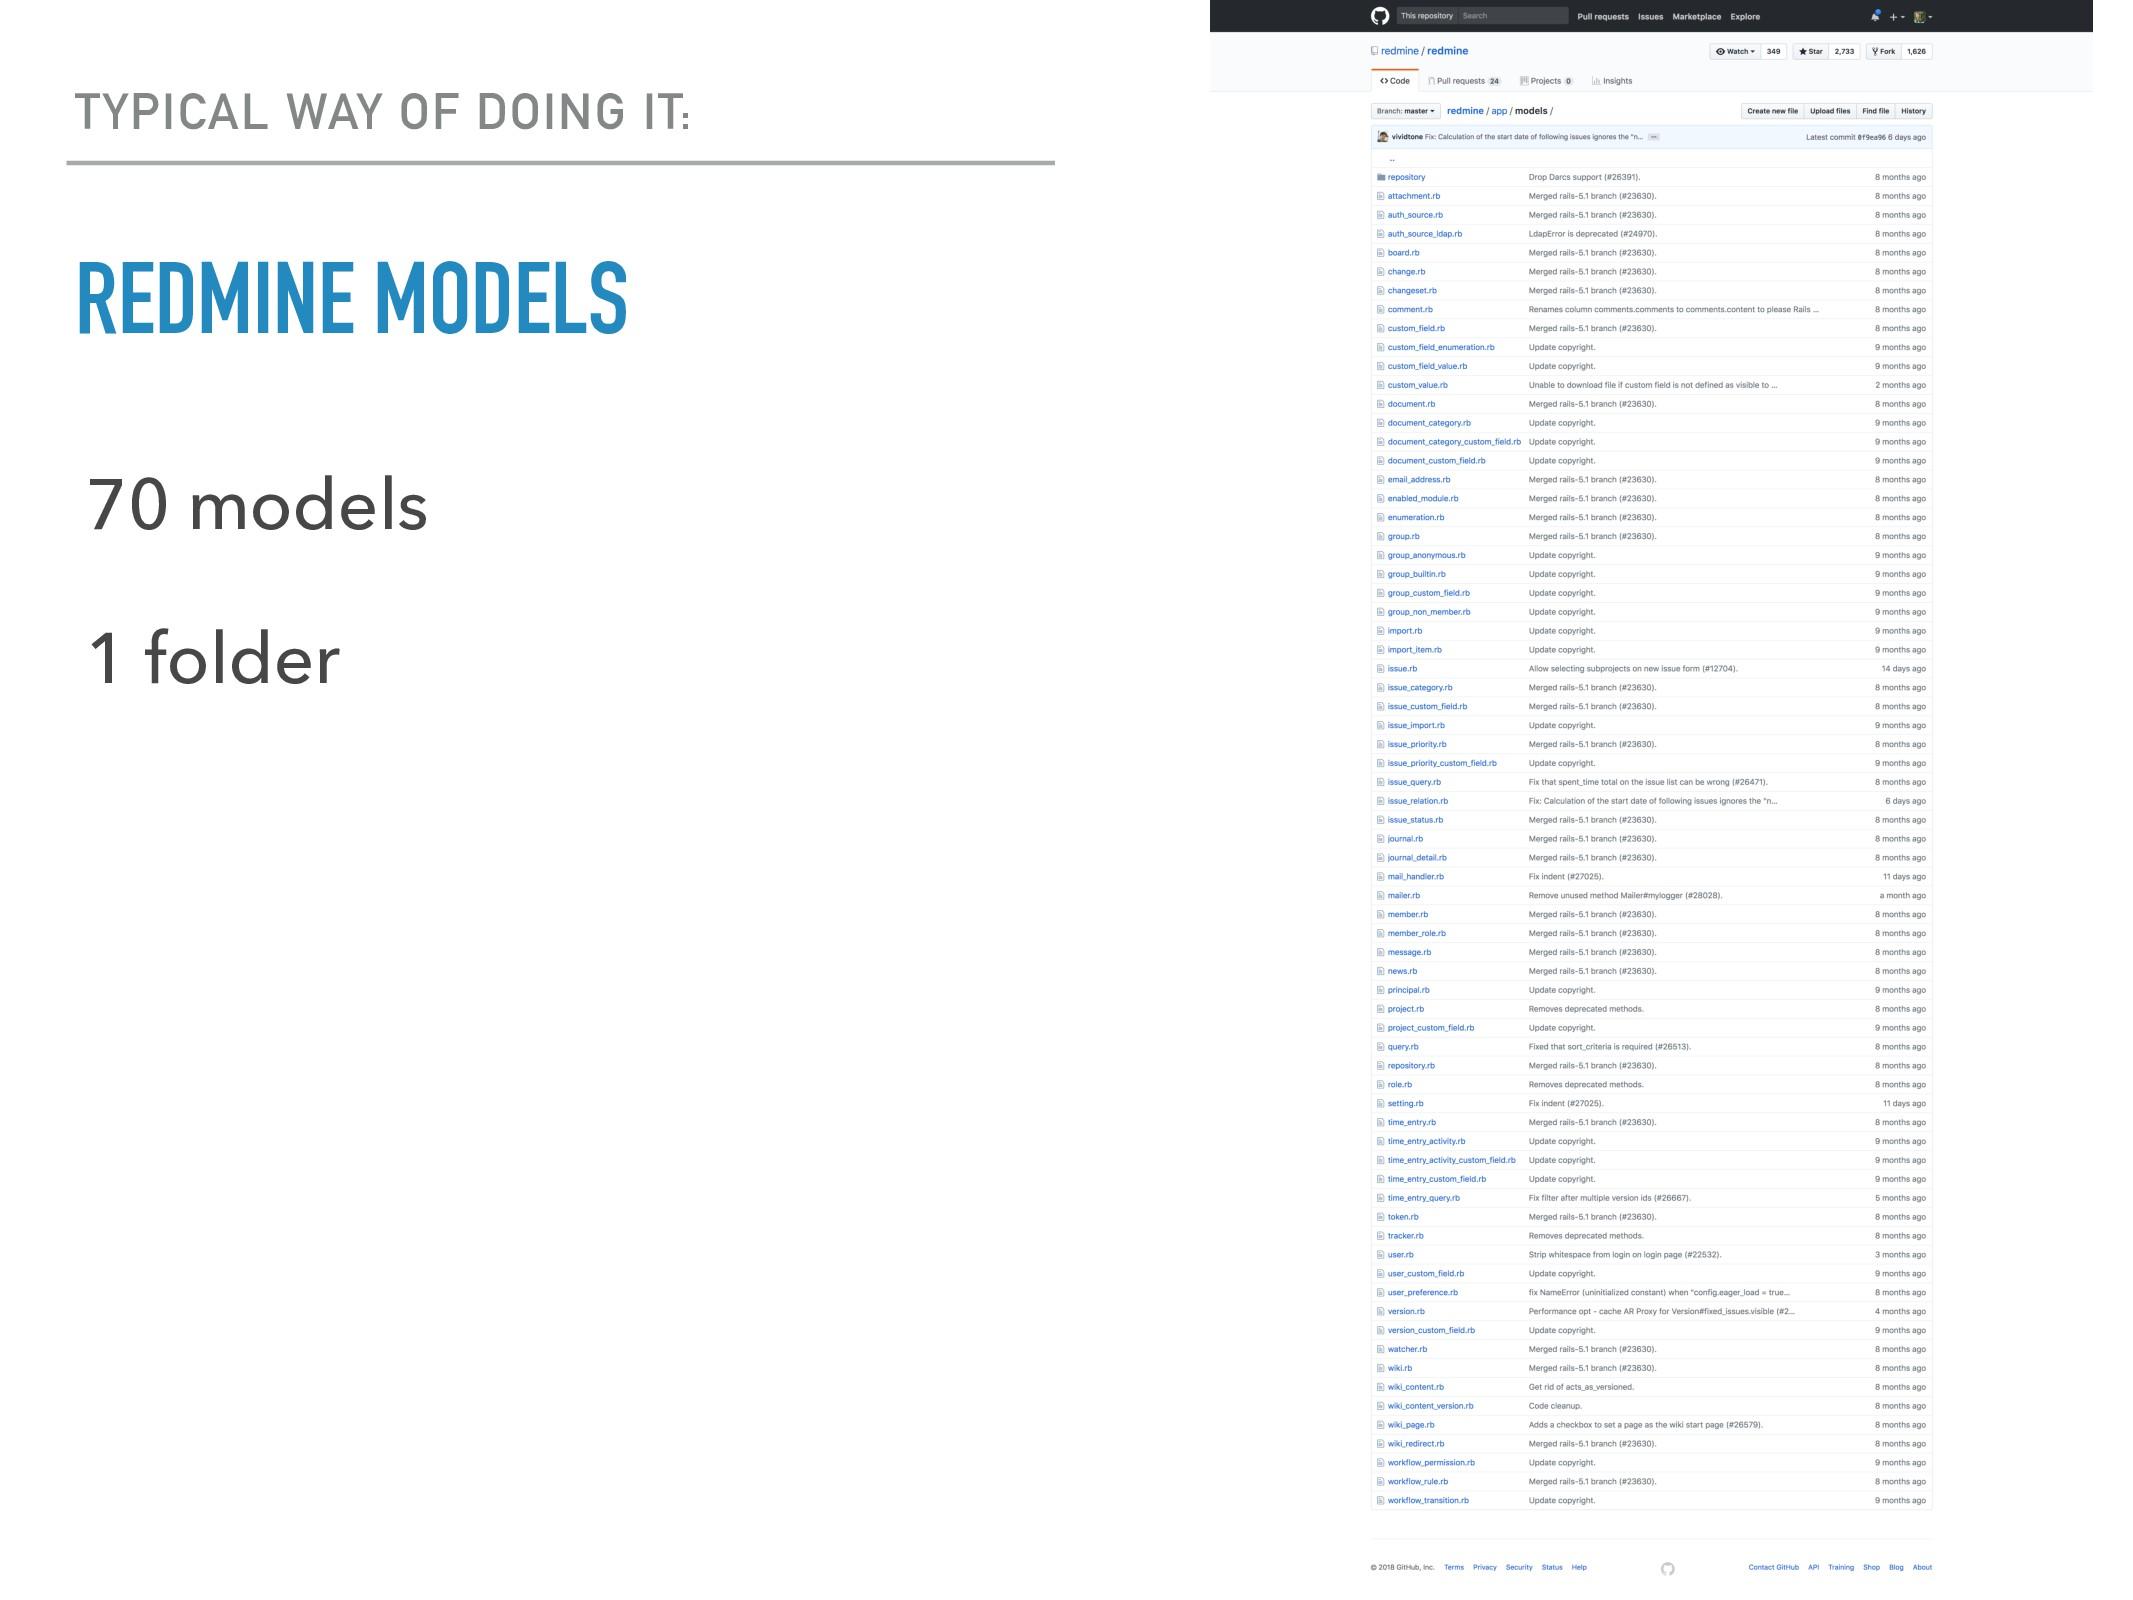 REDMINE MODELS 70 models 1 folder TYPICAL WAY O...